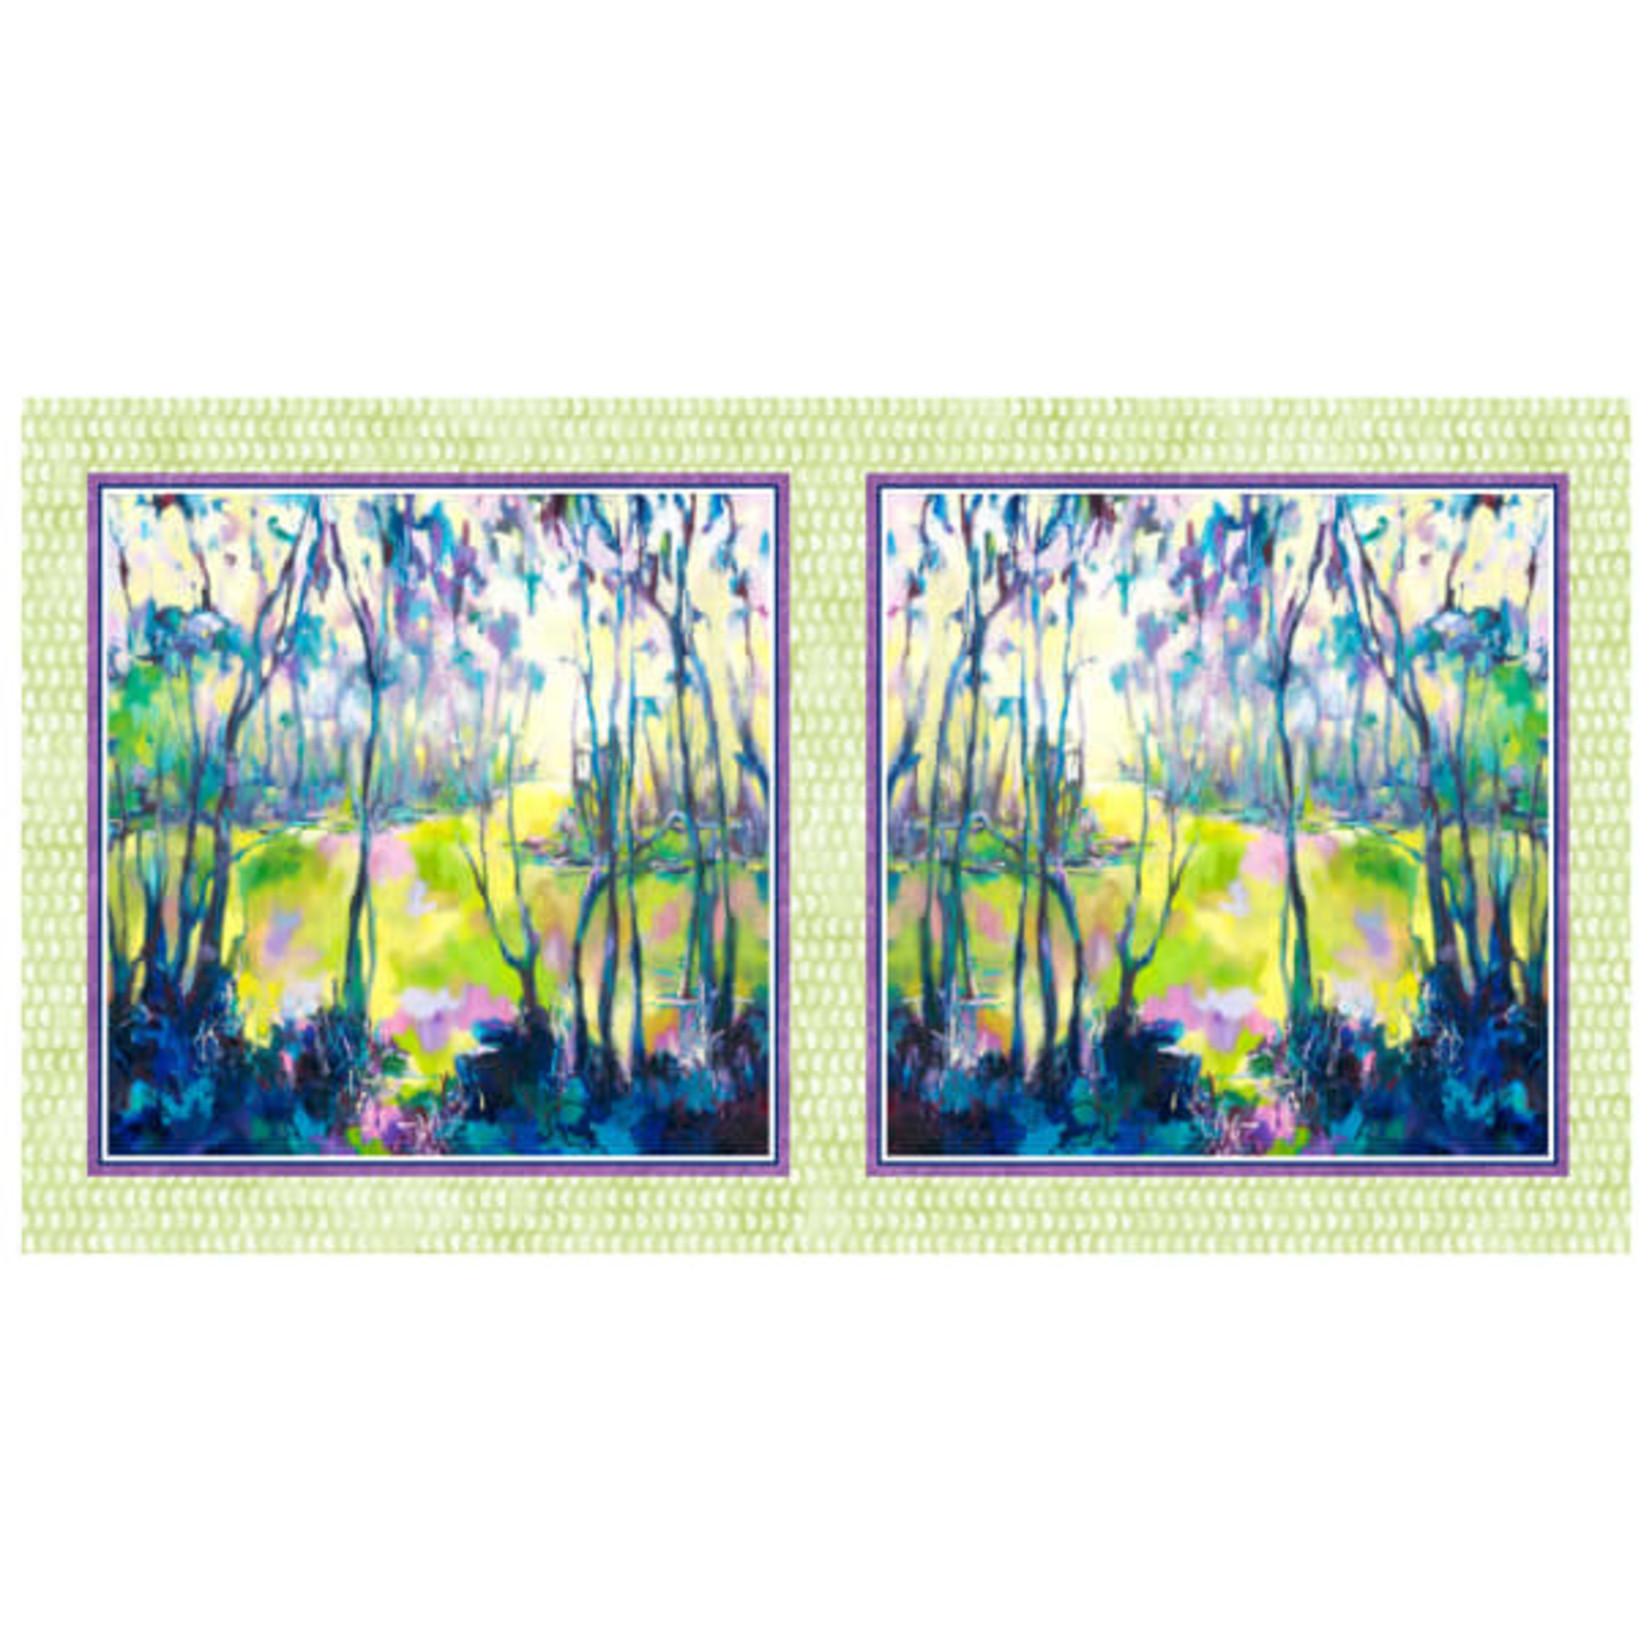 P&B Textiles Naturesong - Dubbel - Panel